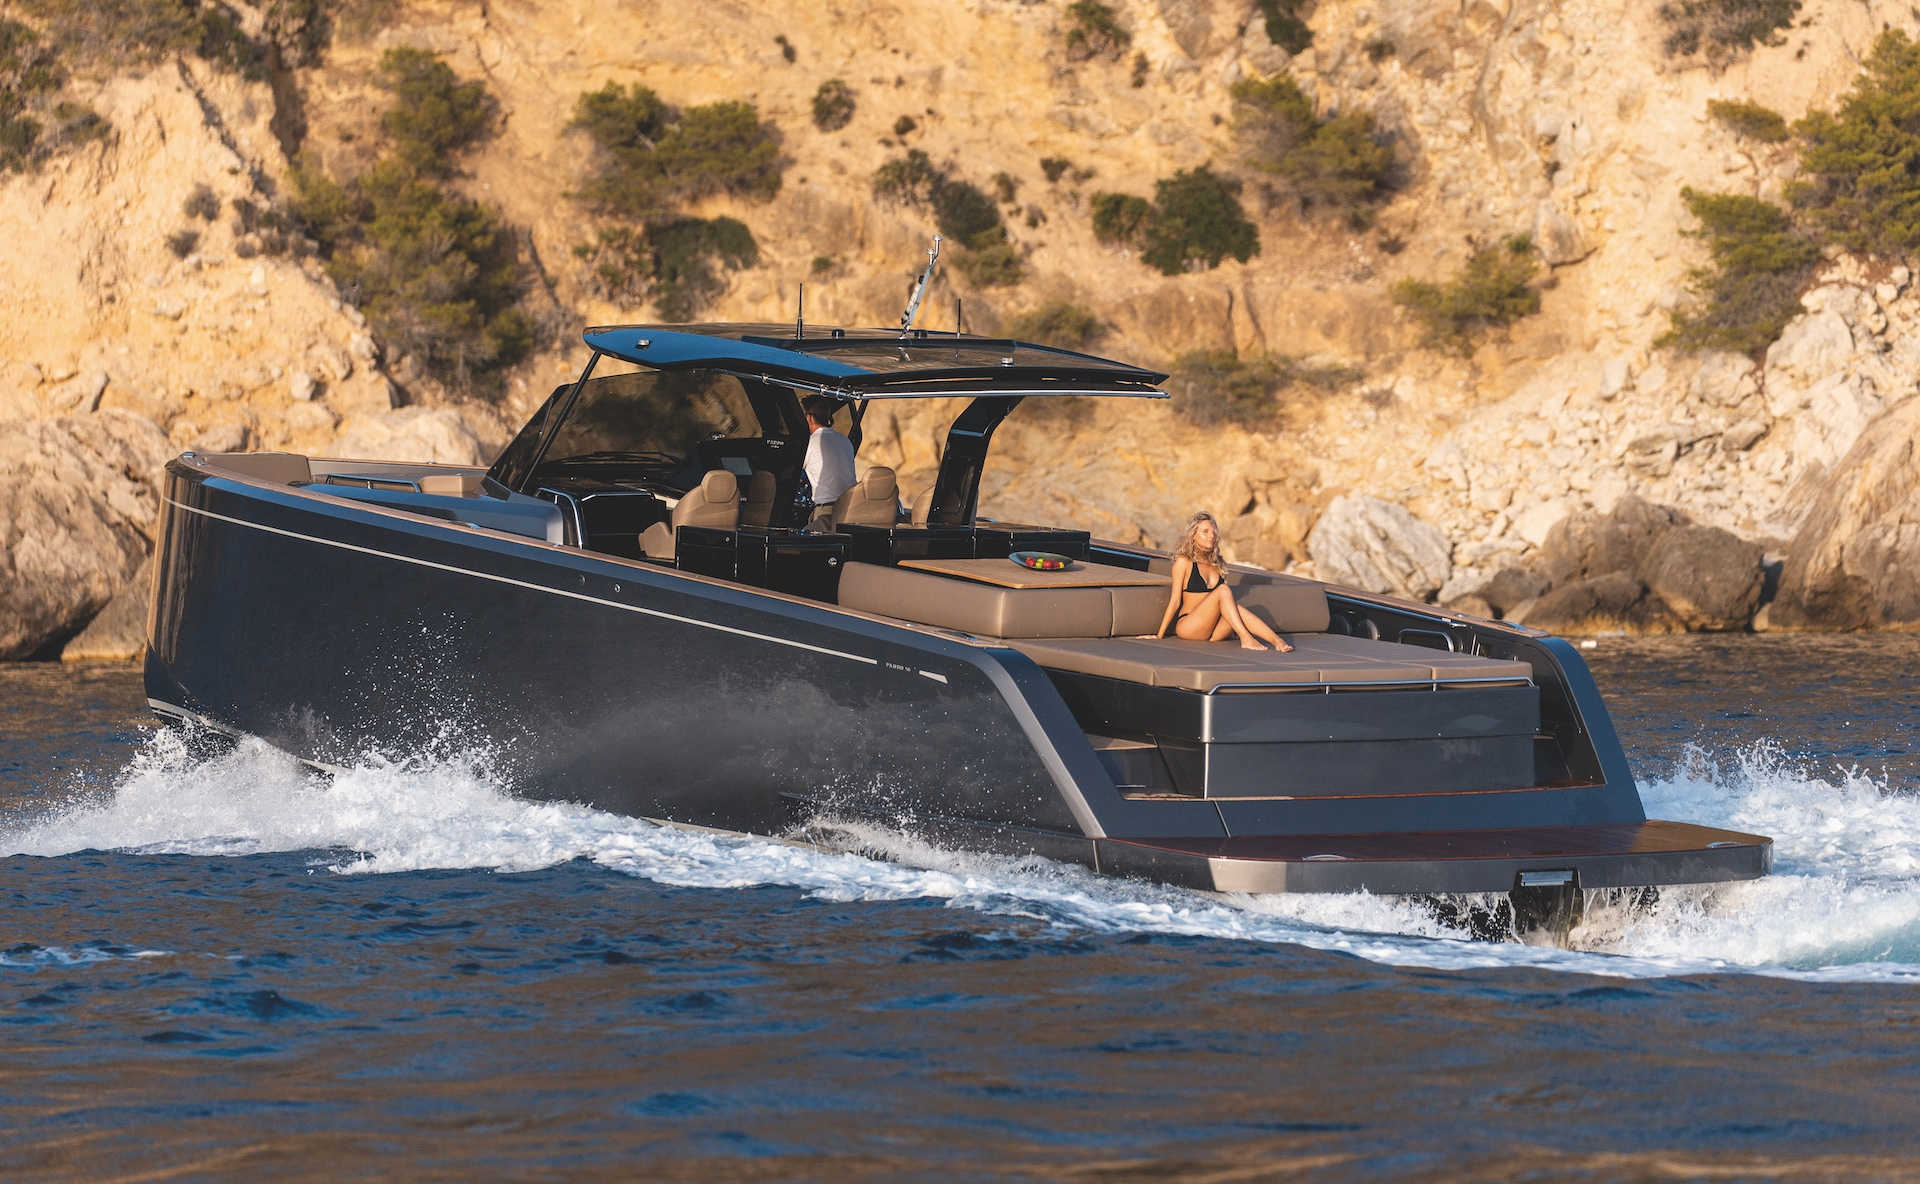 pardo yachts islas baleares